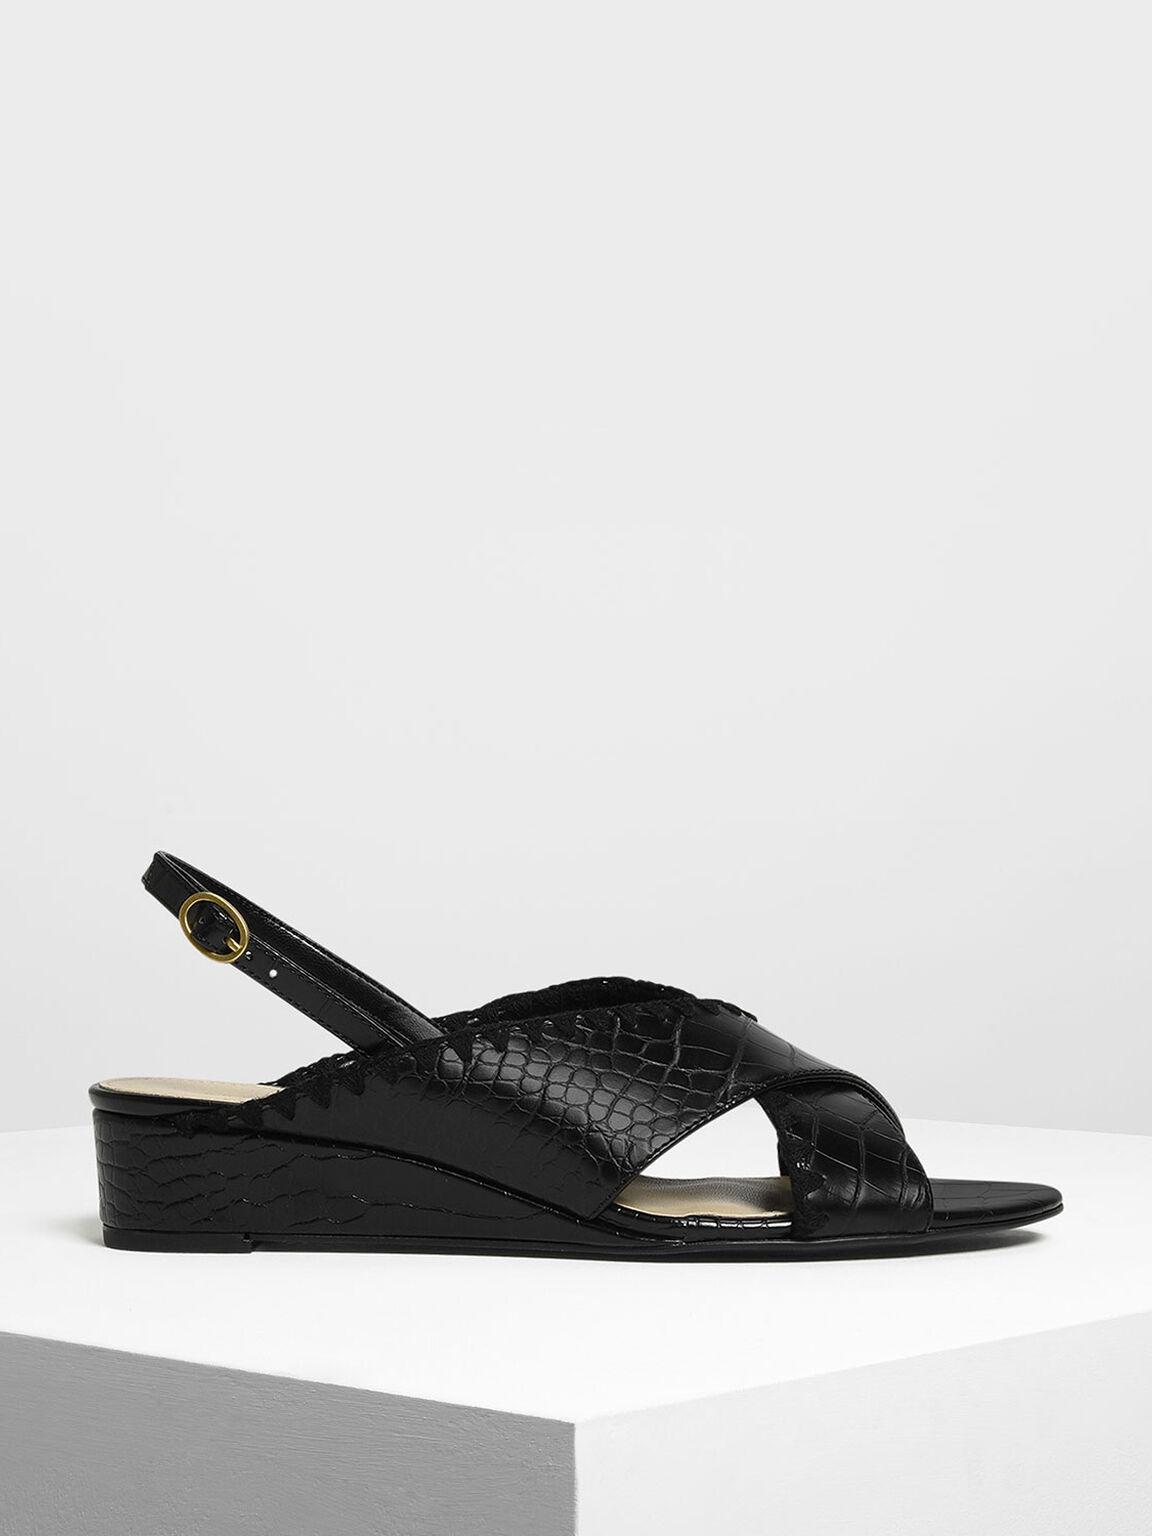 Whipstitch Trim Wedge Sandals, Black, hi-res